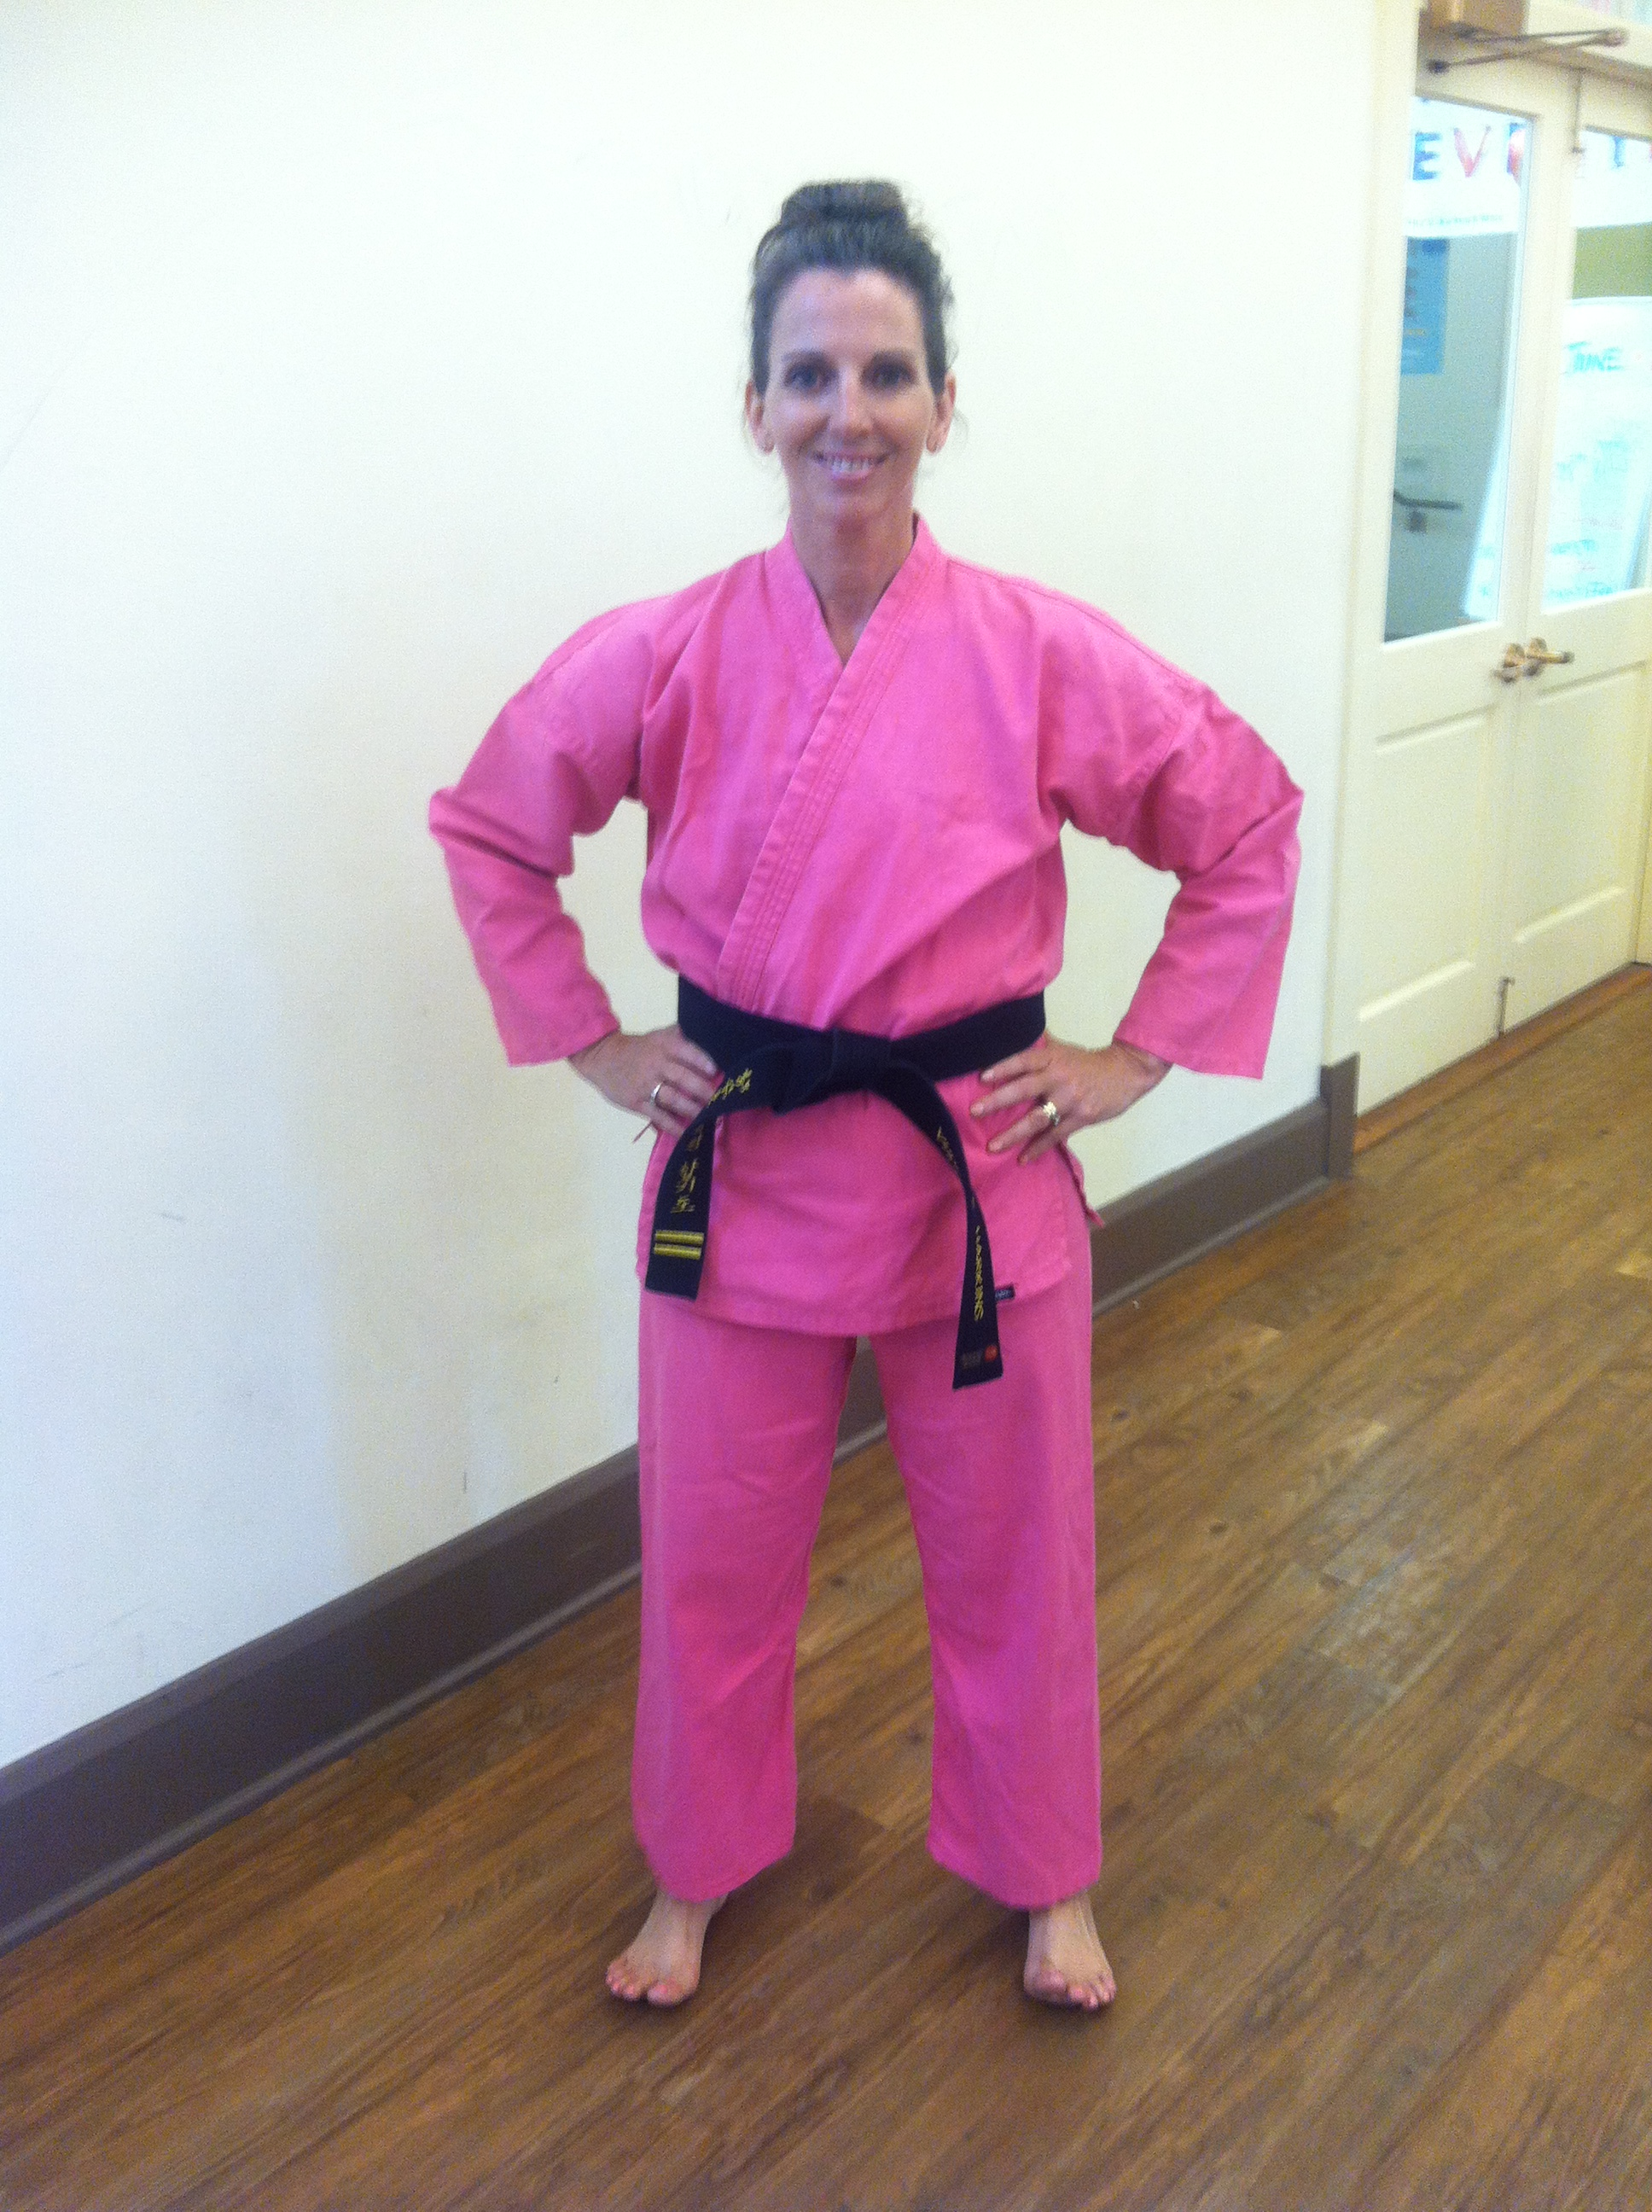 Female Martial Artists Unite The Martial Arts Woman